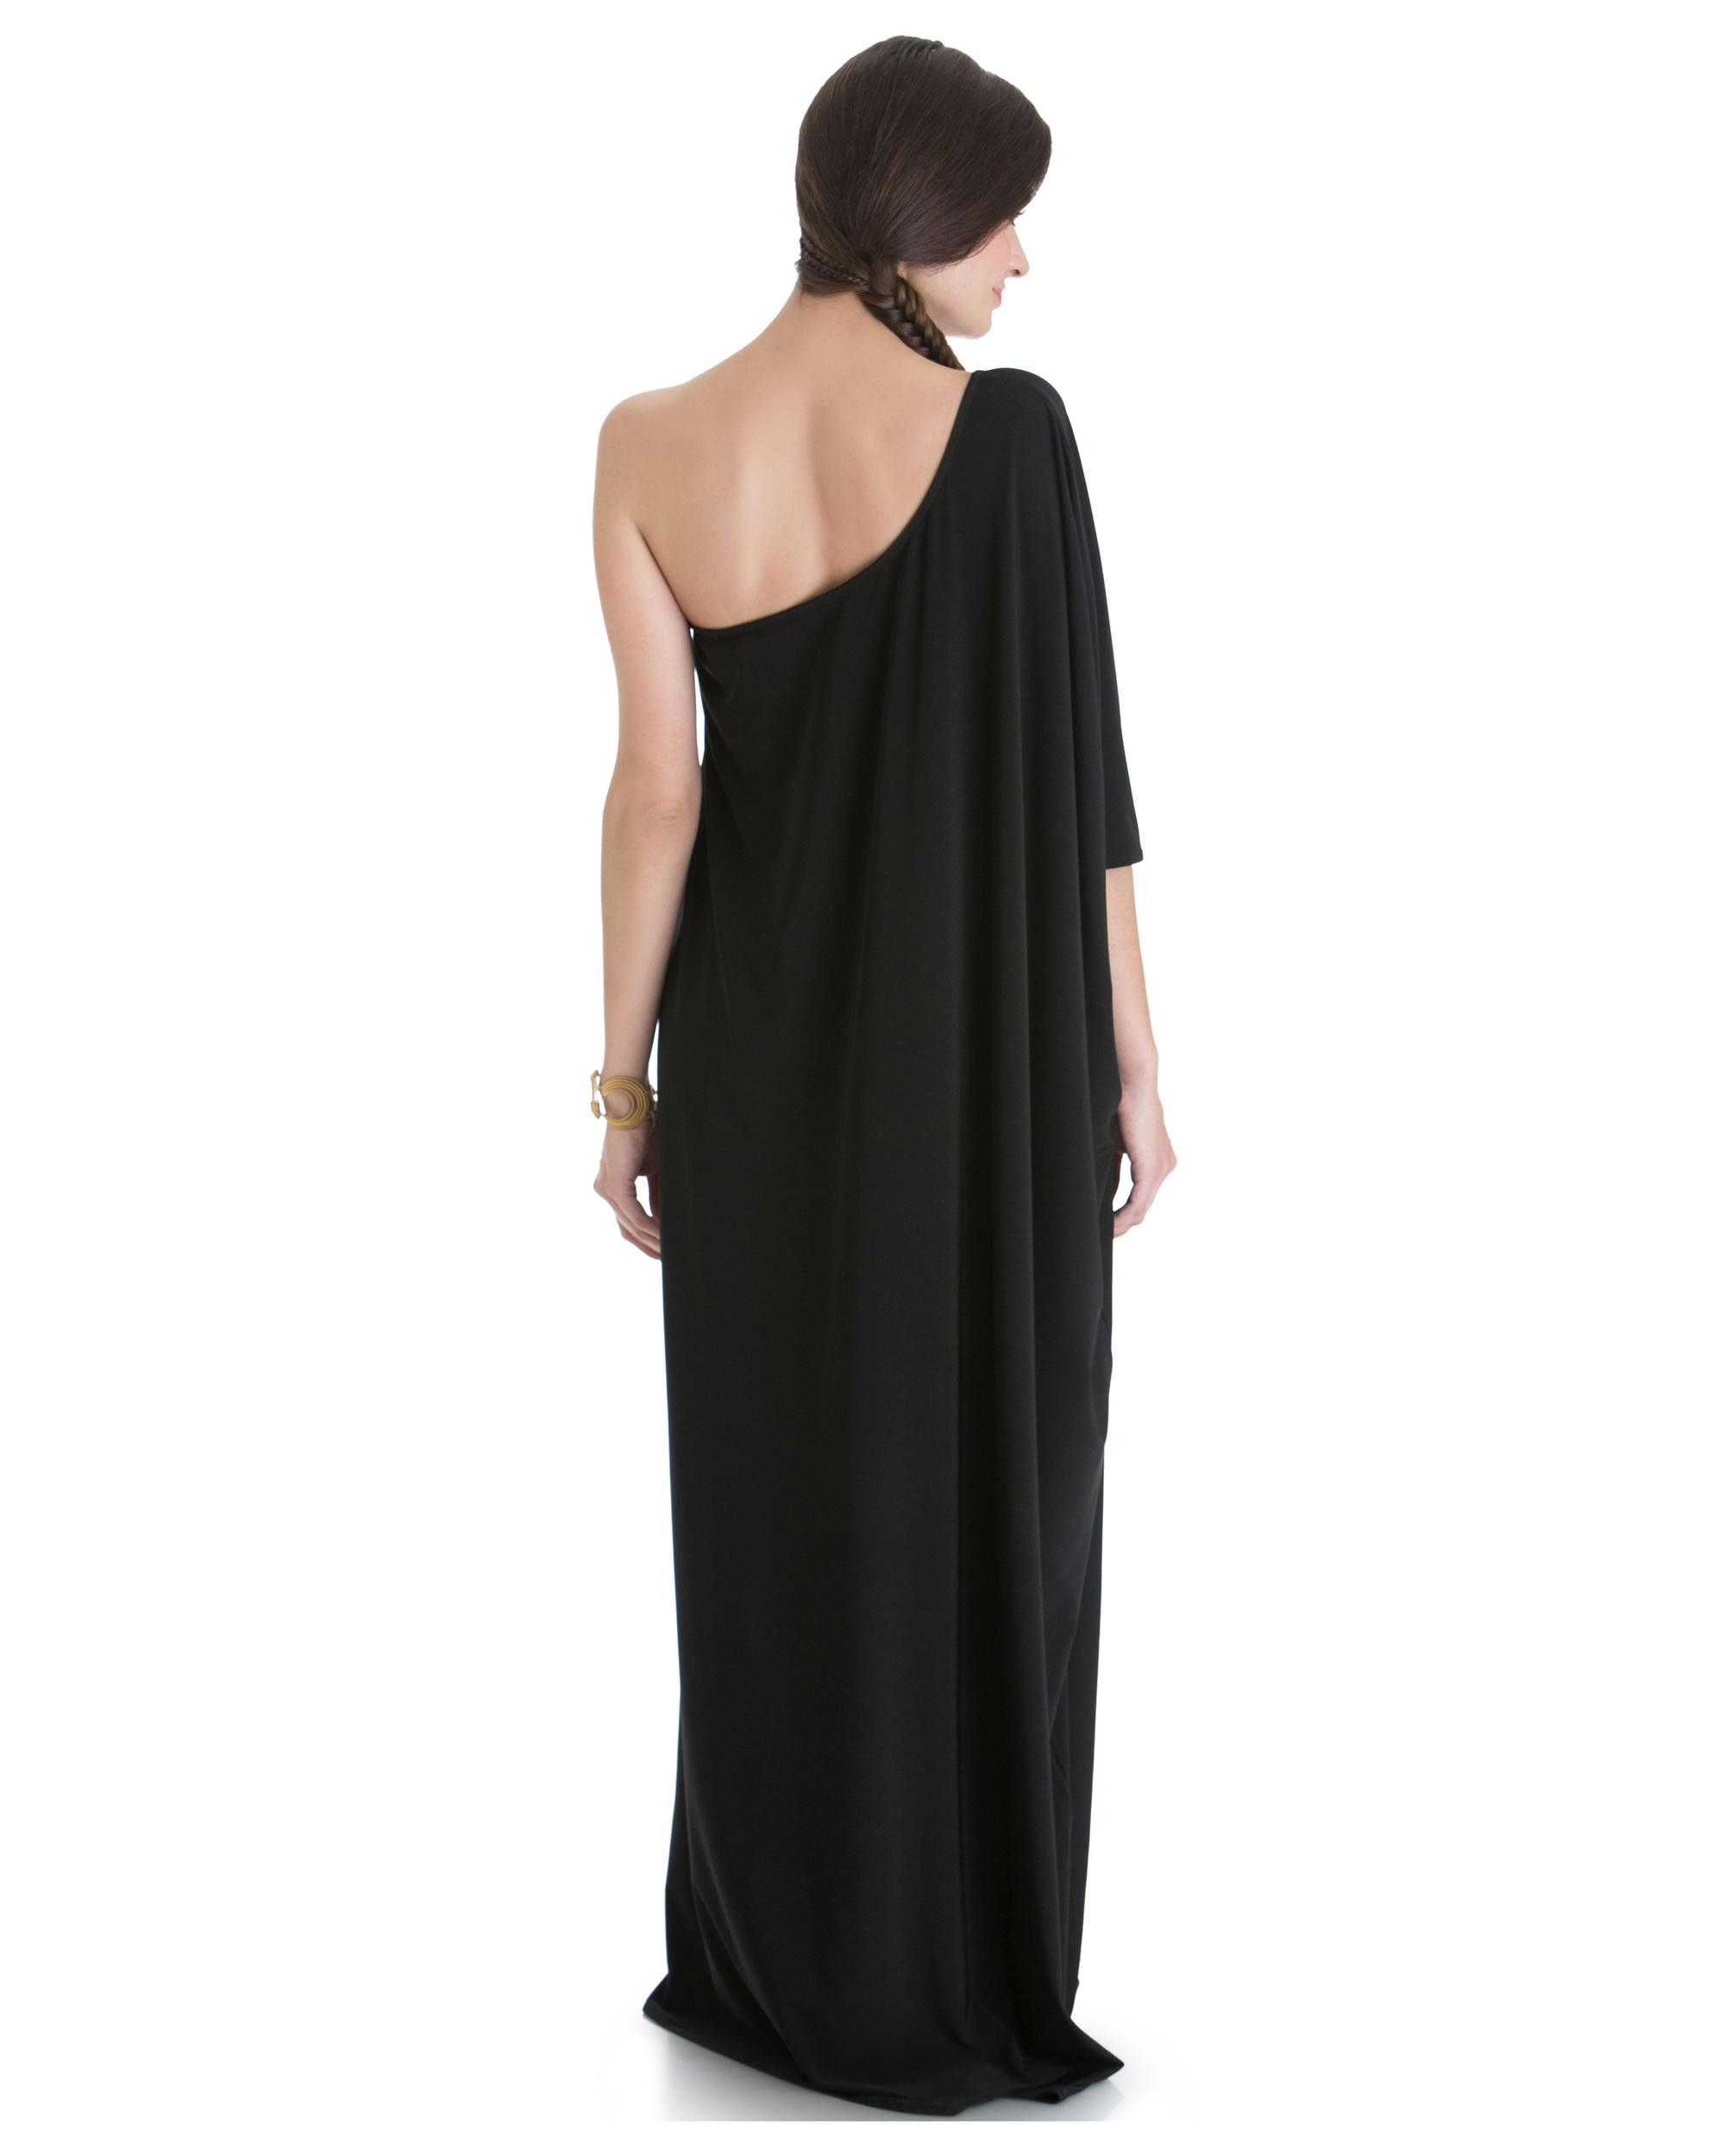 Little Black Cocktail Dress Styles